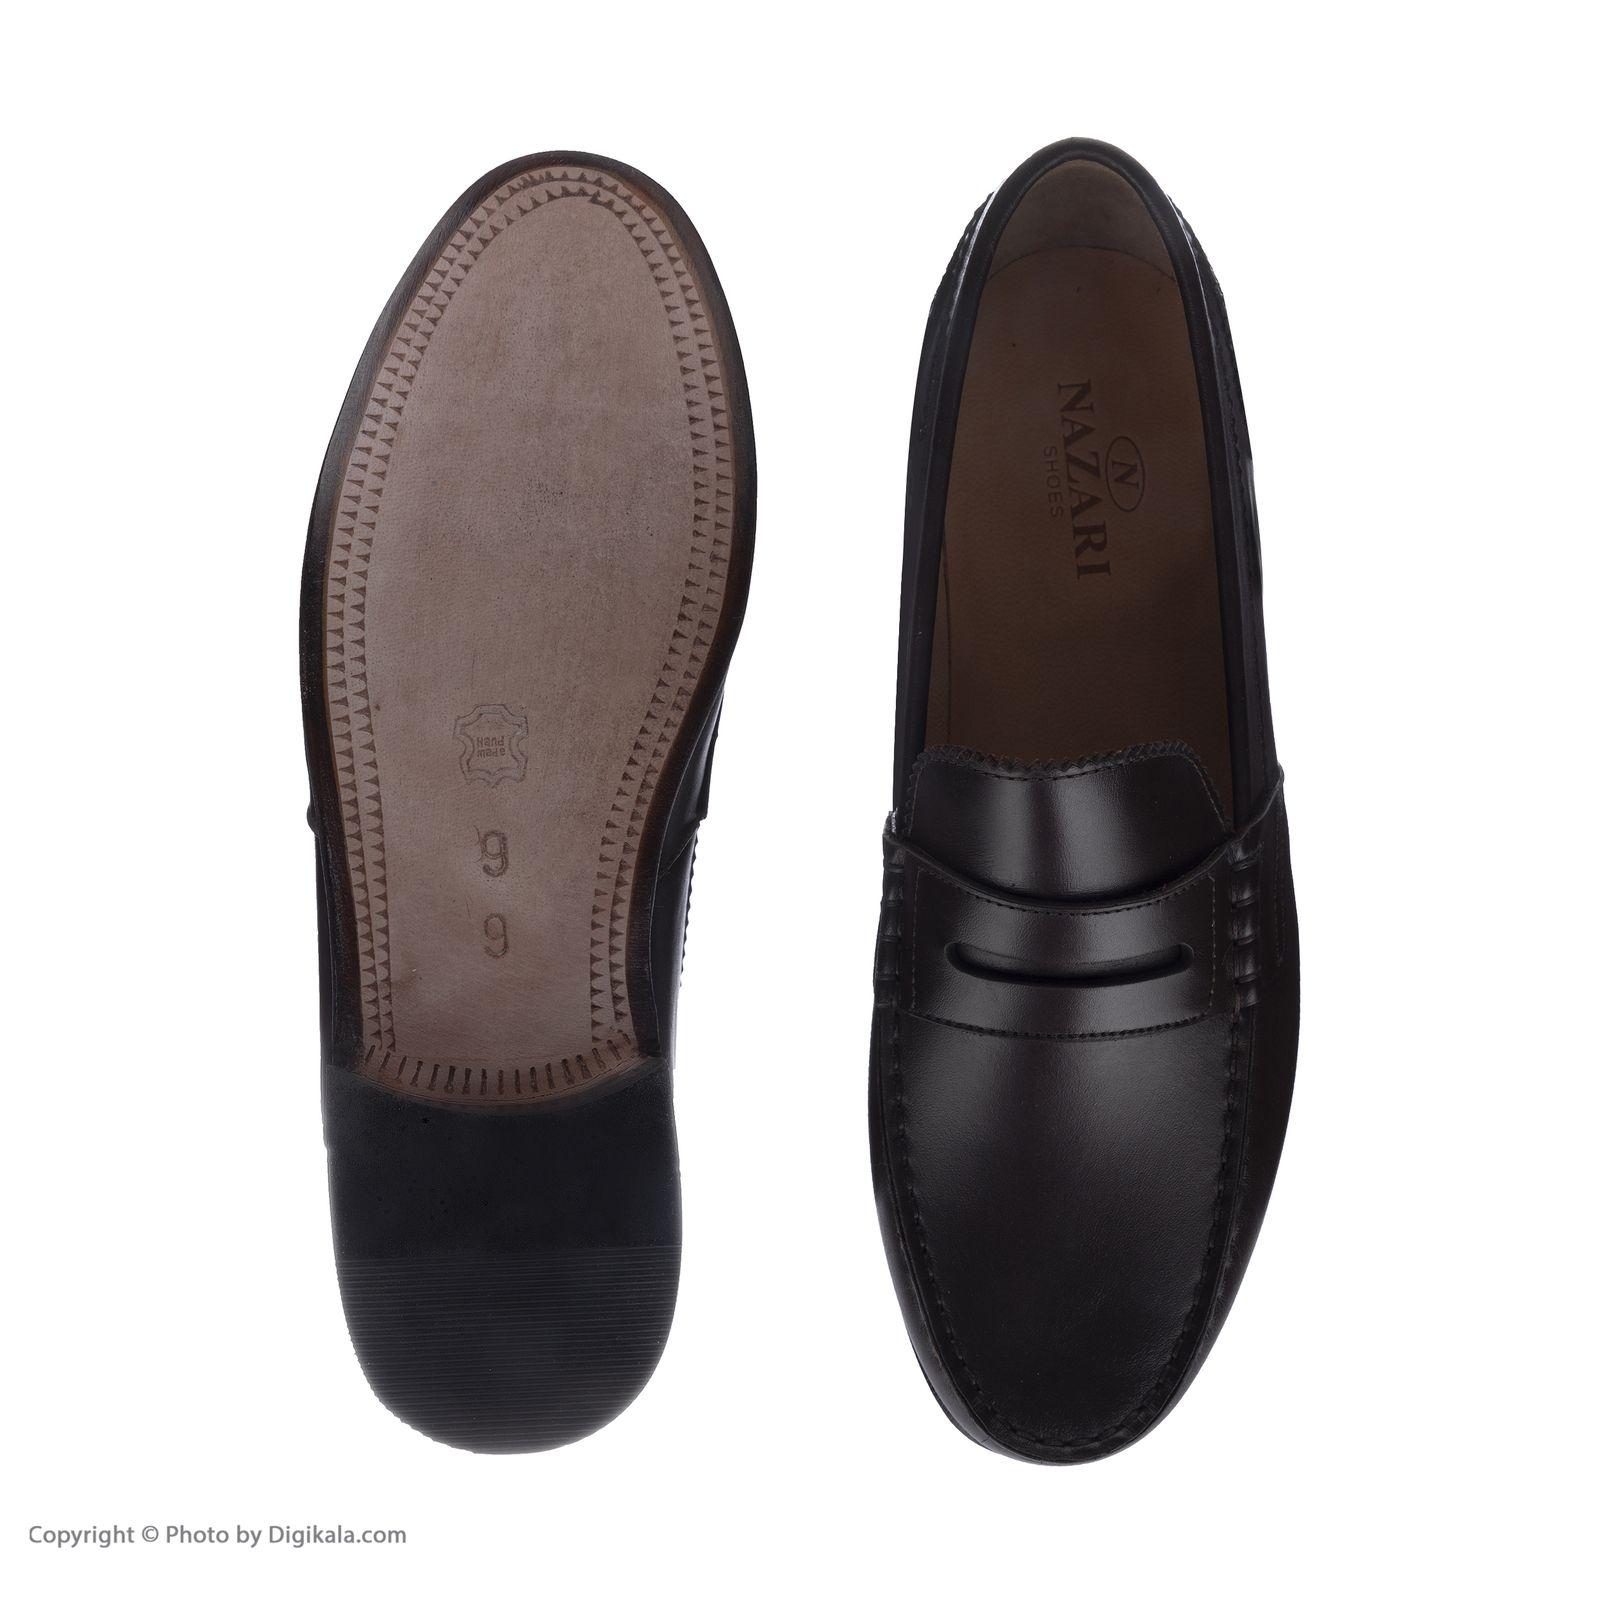 کفش مردانه نظری کد 436 -  - 3